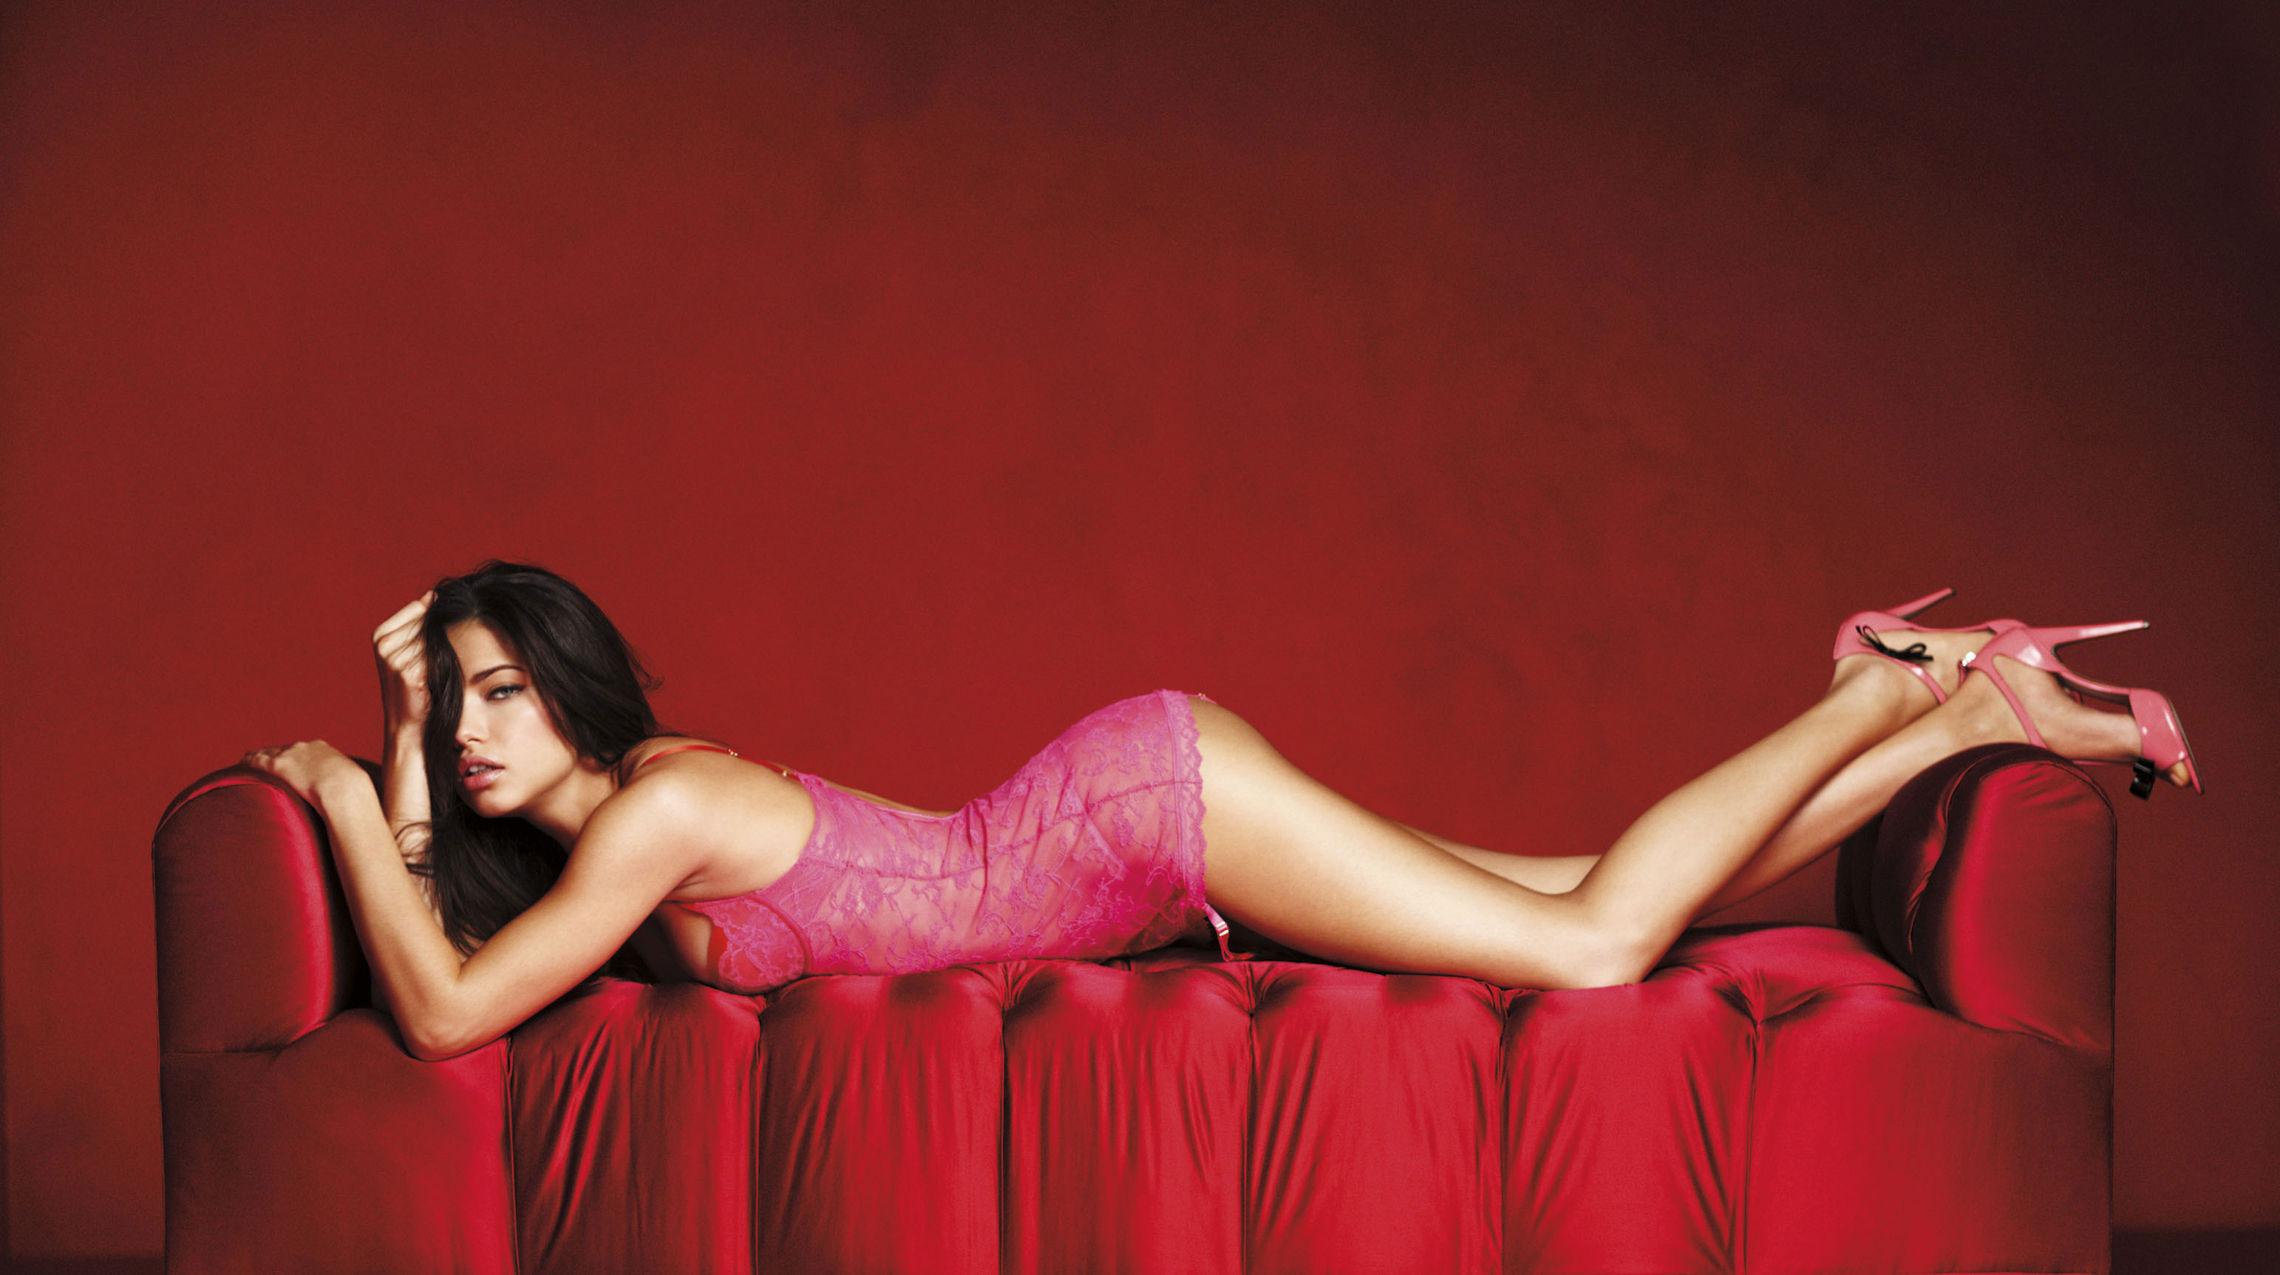 Adriana Lima – Victoria's Secret Love Me Valnetine's Day Campaign